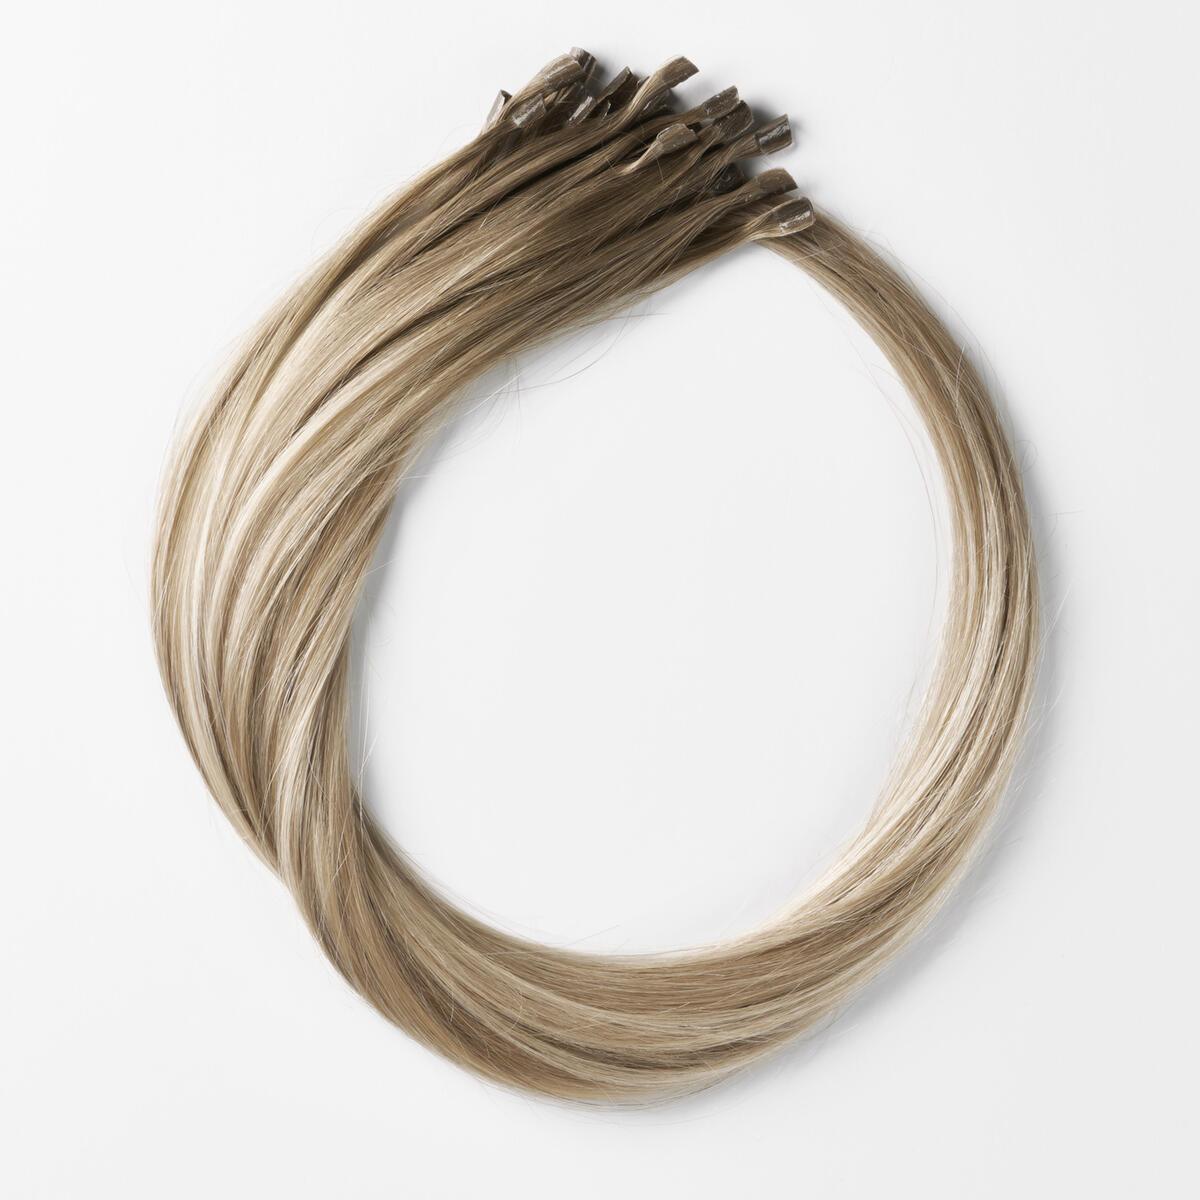 Bondings Premium Glatt B2.6/10.7 Dark Ashy Blonde Balayage 50 cm